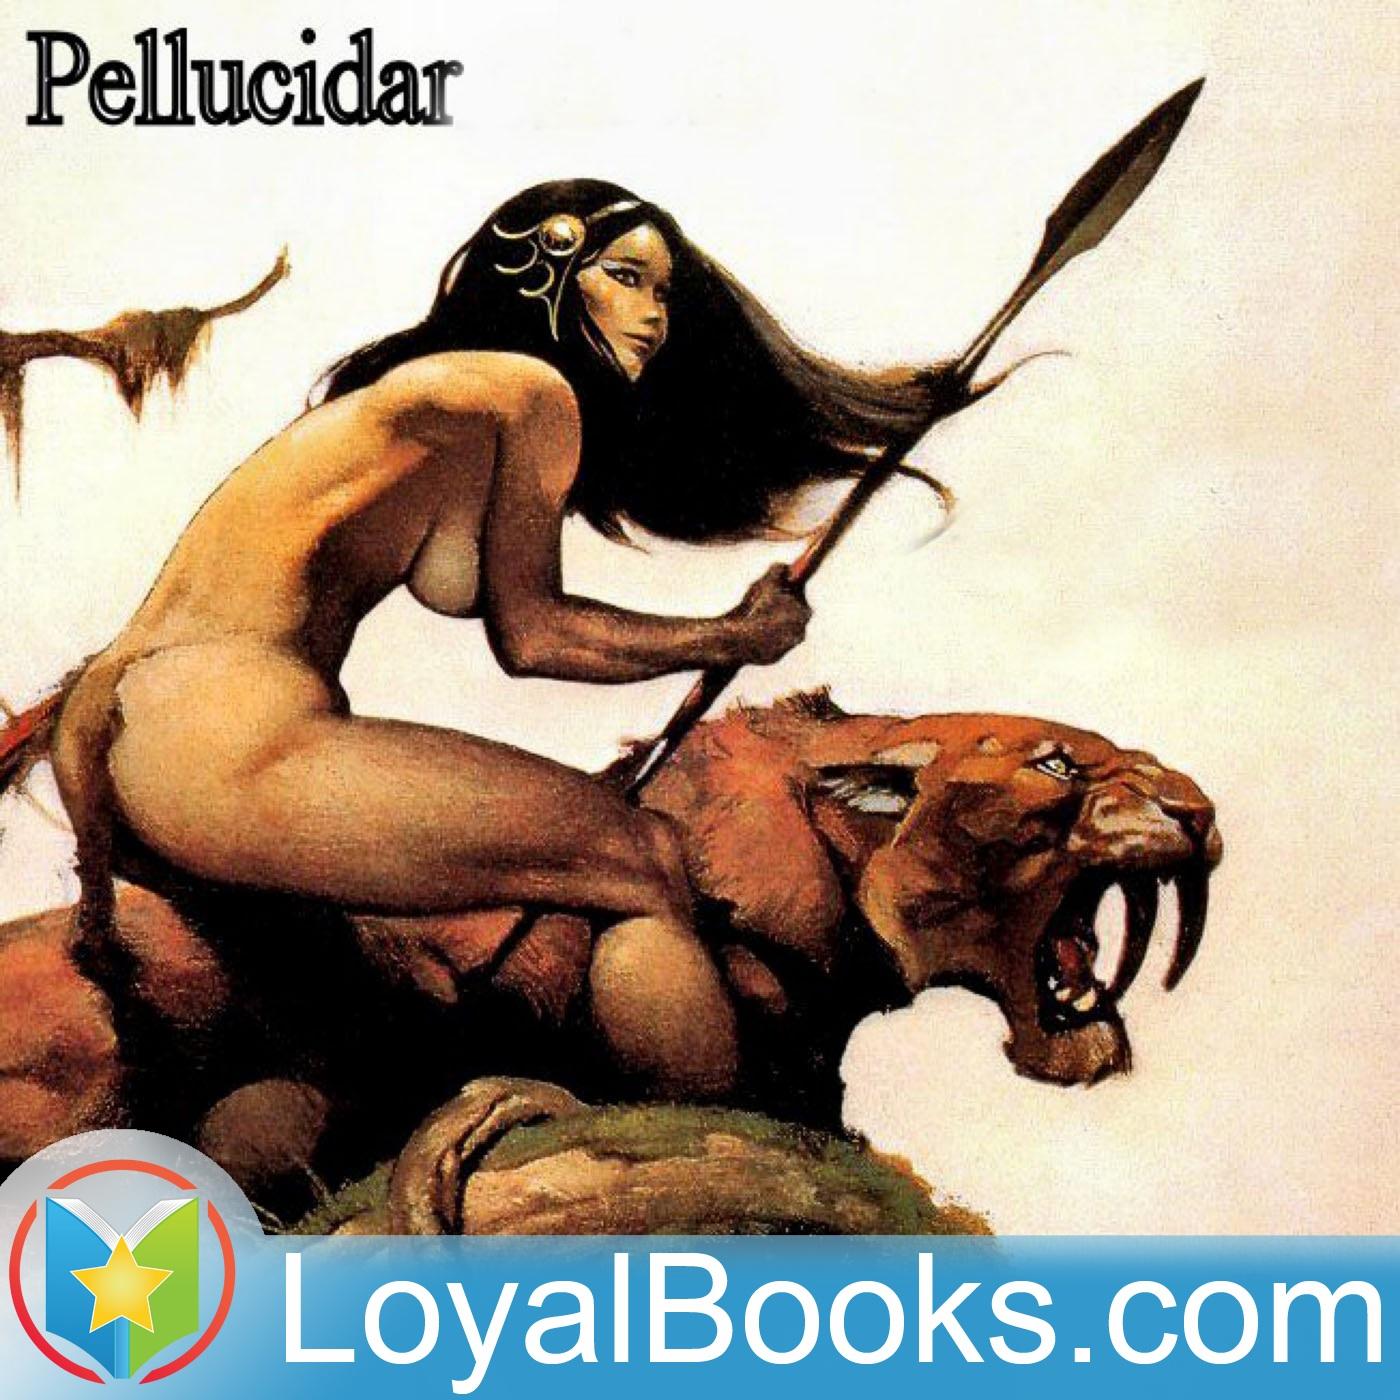 <![CDATA[Pellucidar by Edgar Rice Burroughs]]>